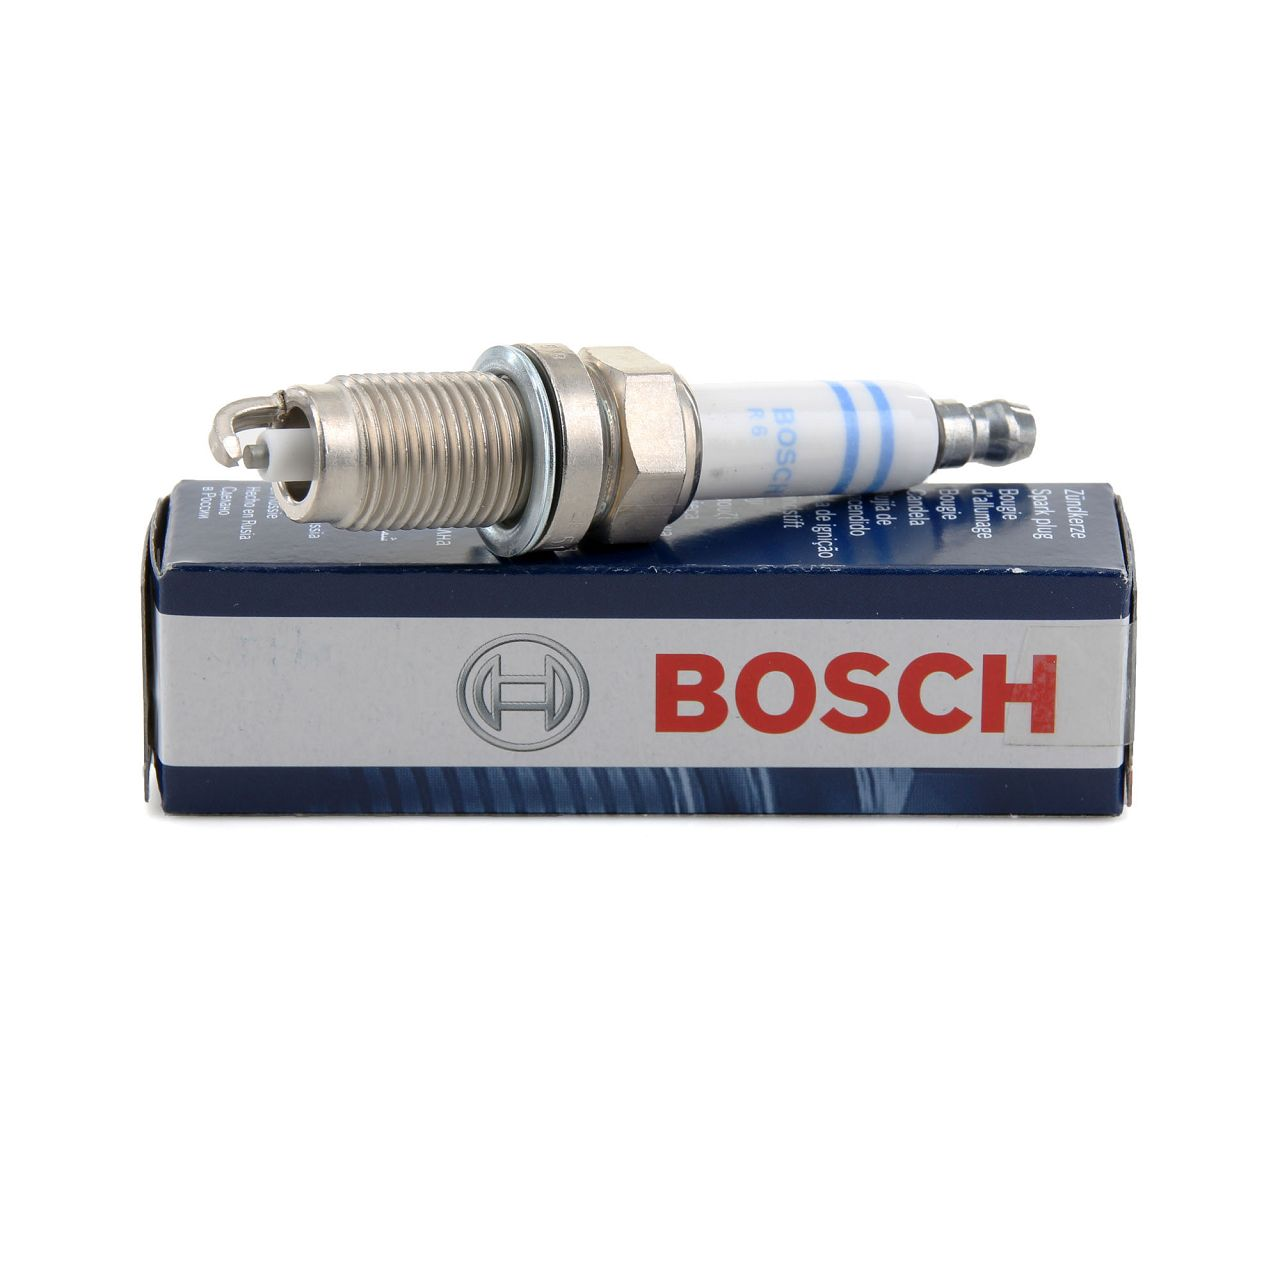 BOSCH Zündkerze Super Plus FR7HC+ 0242236565 für JEEP SEAT SKODA VW